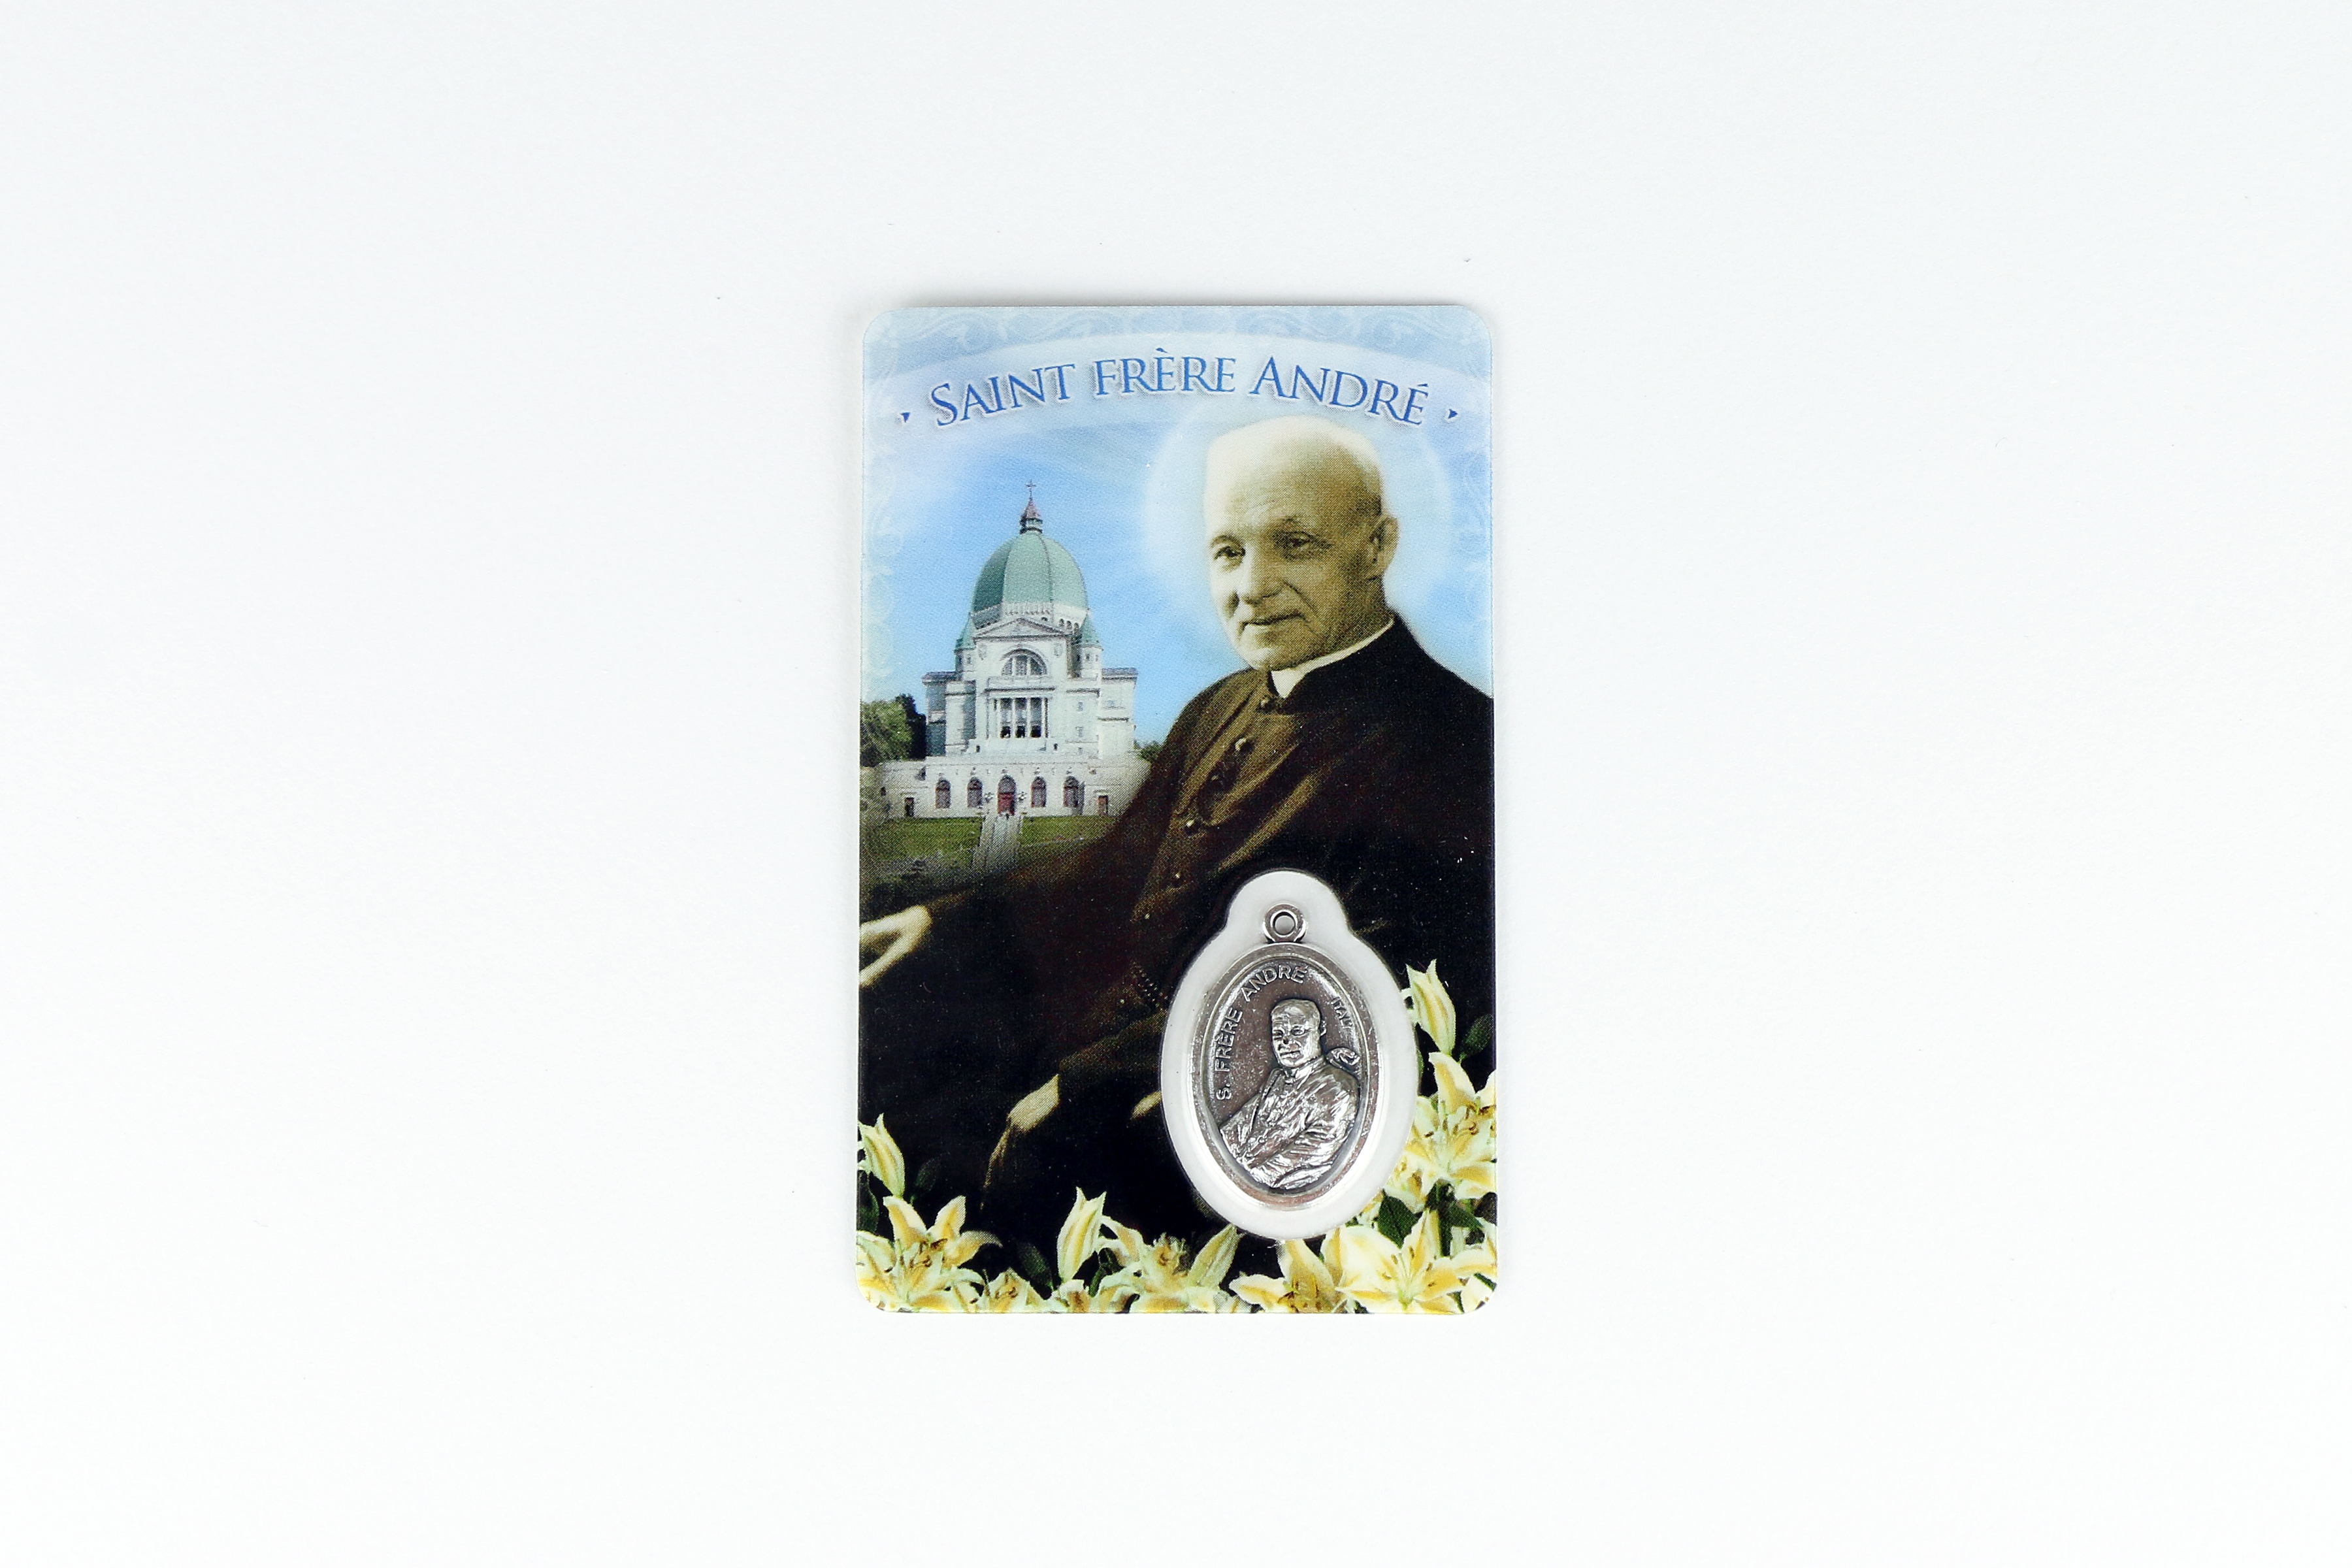 oratoire-st-joseph-carte-medaille-saint-frere-andre